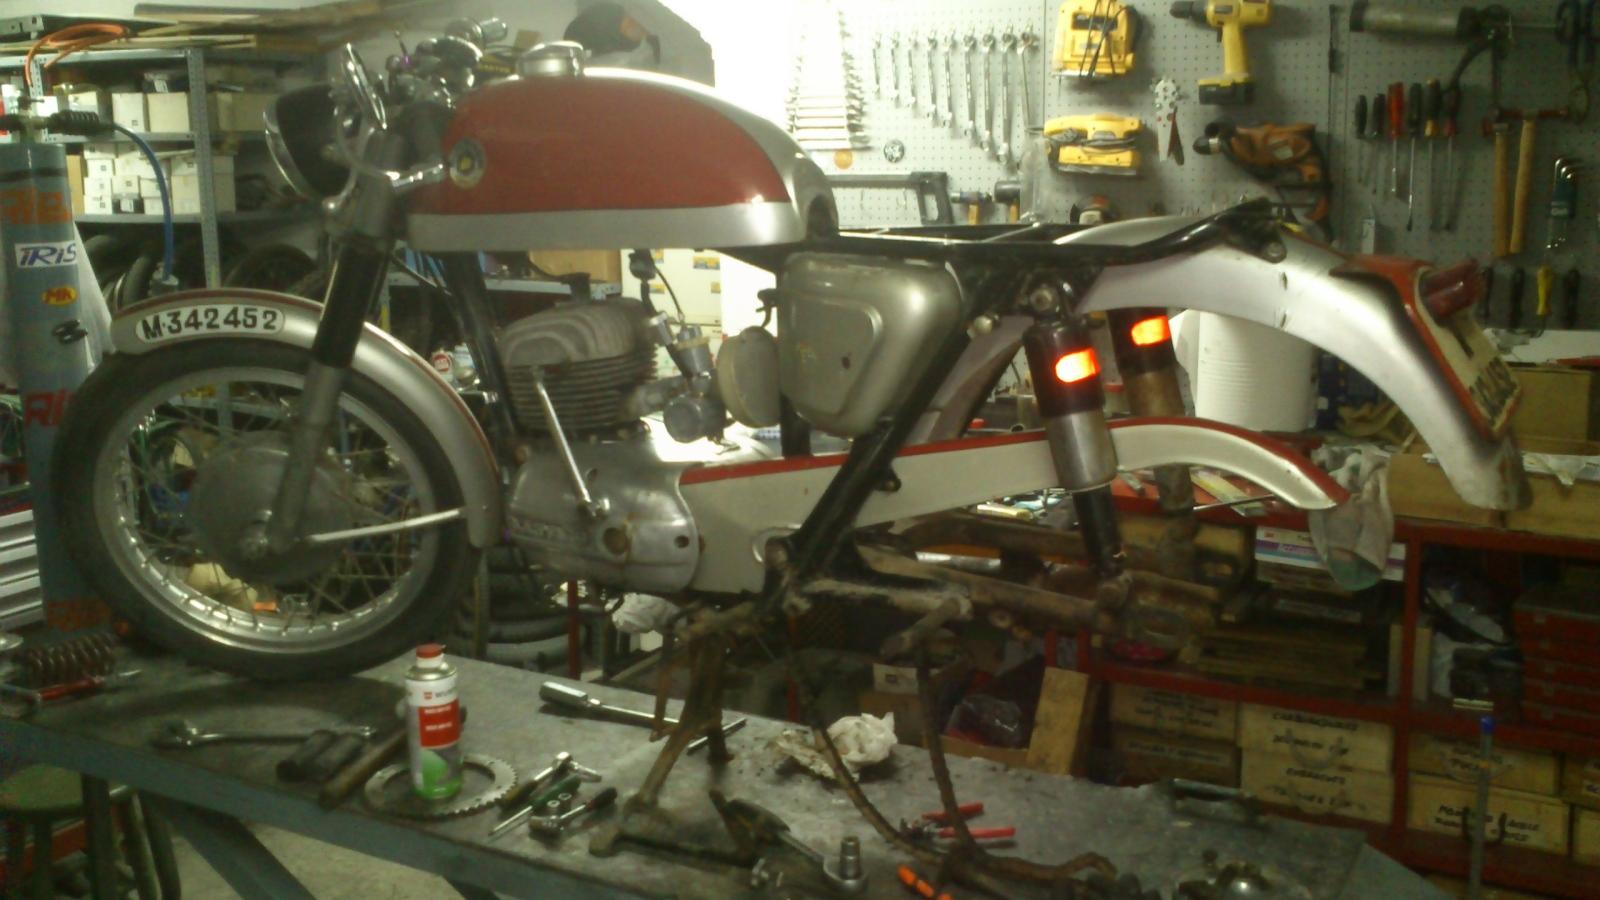 De vuelta a la carretera: Bultaco Tralla 102 1z3qly0